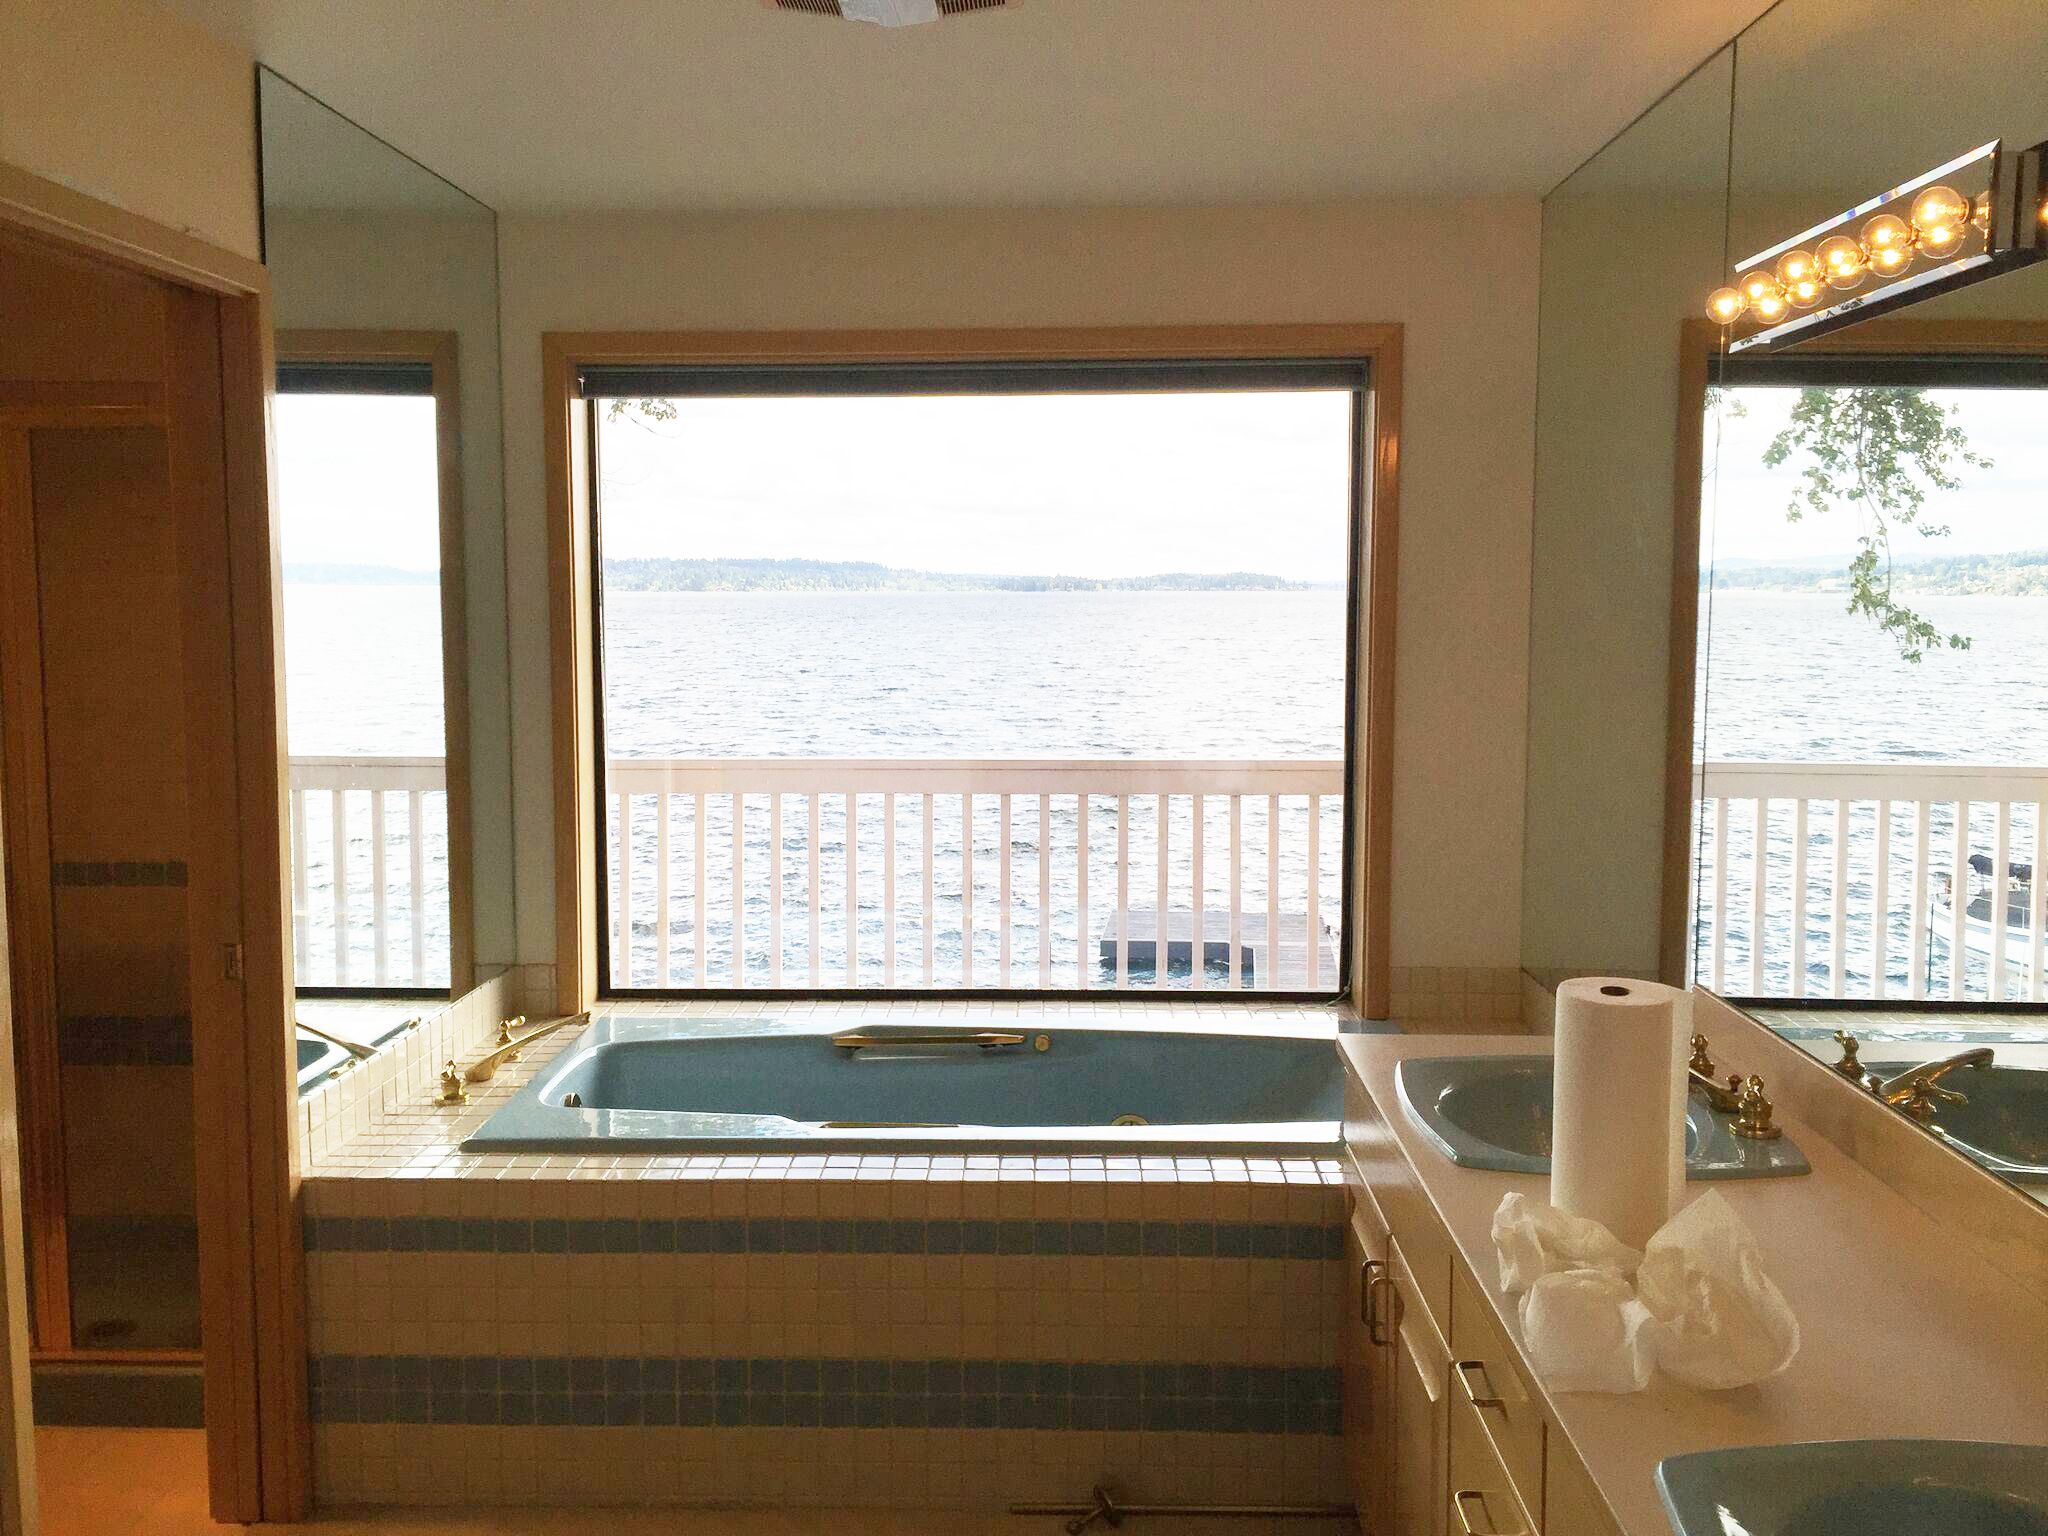 Bathroom remodel kirkland - This Kirkland Bathroom Remodel Will Have You